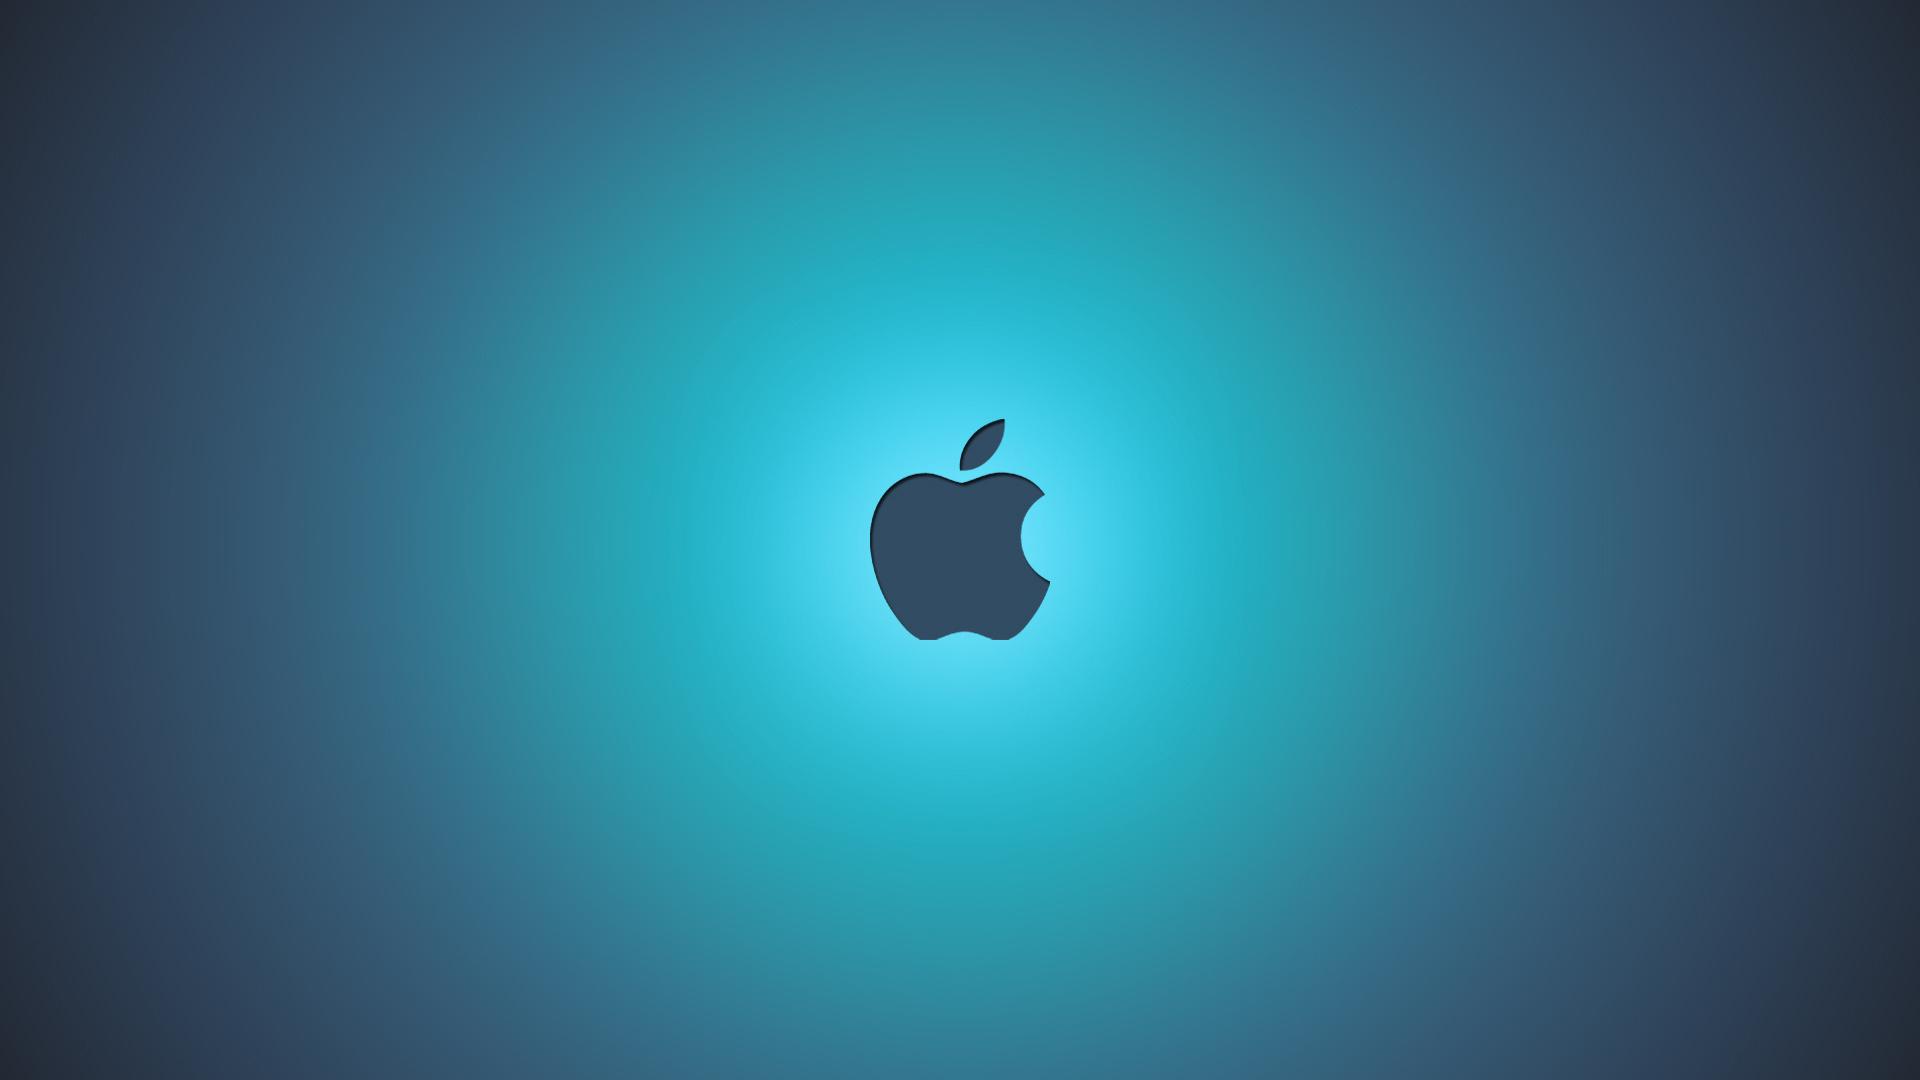 Apple Blue Background Wallpaper Desktop Wallpaper with 1920x1080 1920x1080